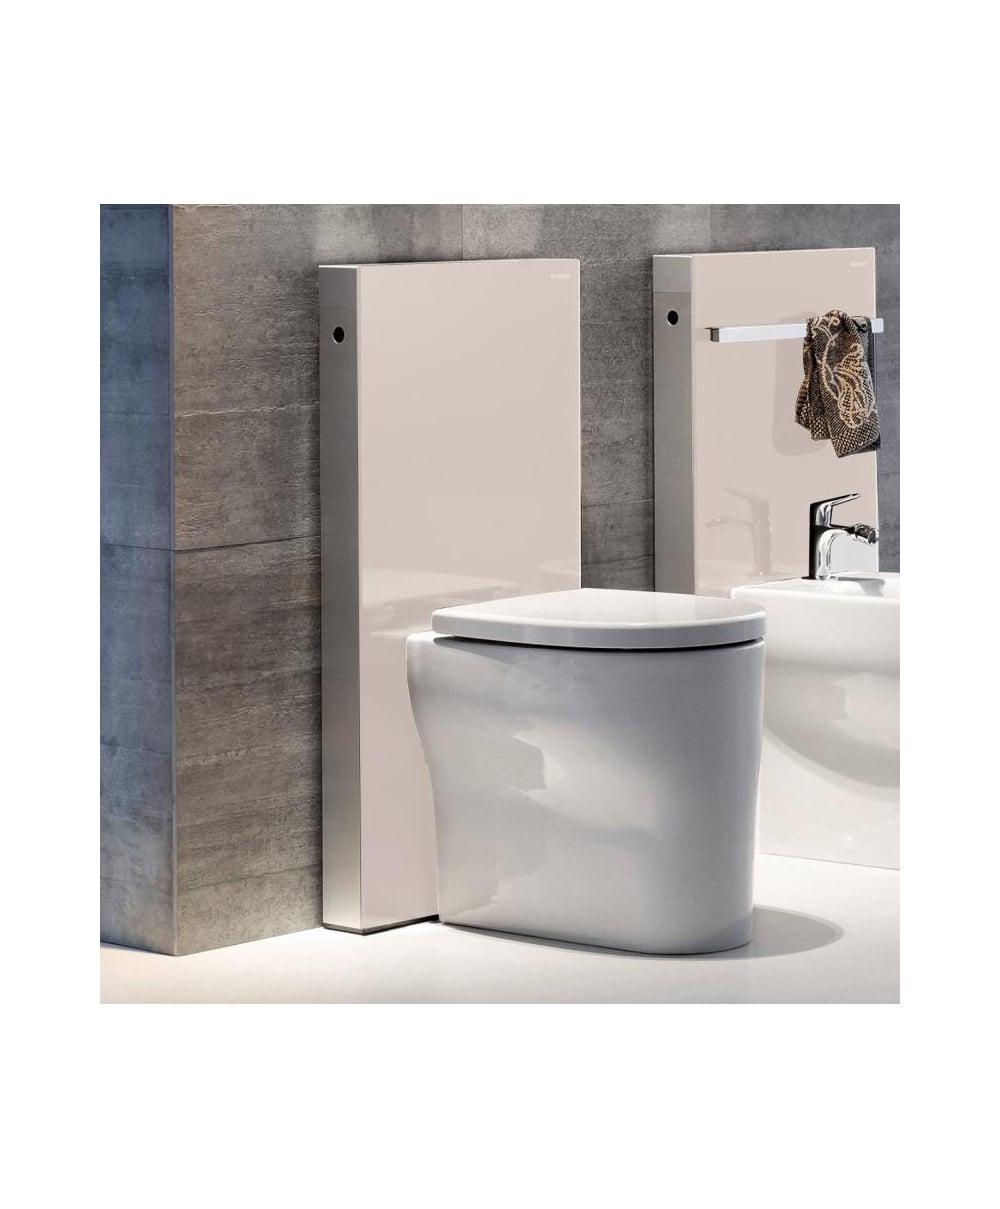 geberit wc stunning bathroom with geberit flush plate sigma with geberit wc affordable geberit. Black Bedroom Furniture Sets. Home Design Ideas